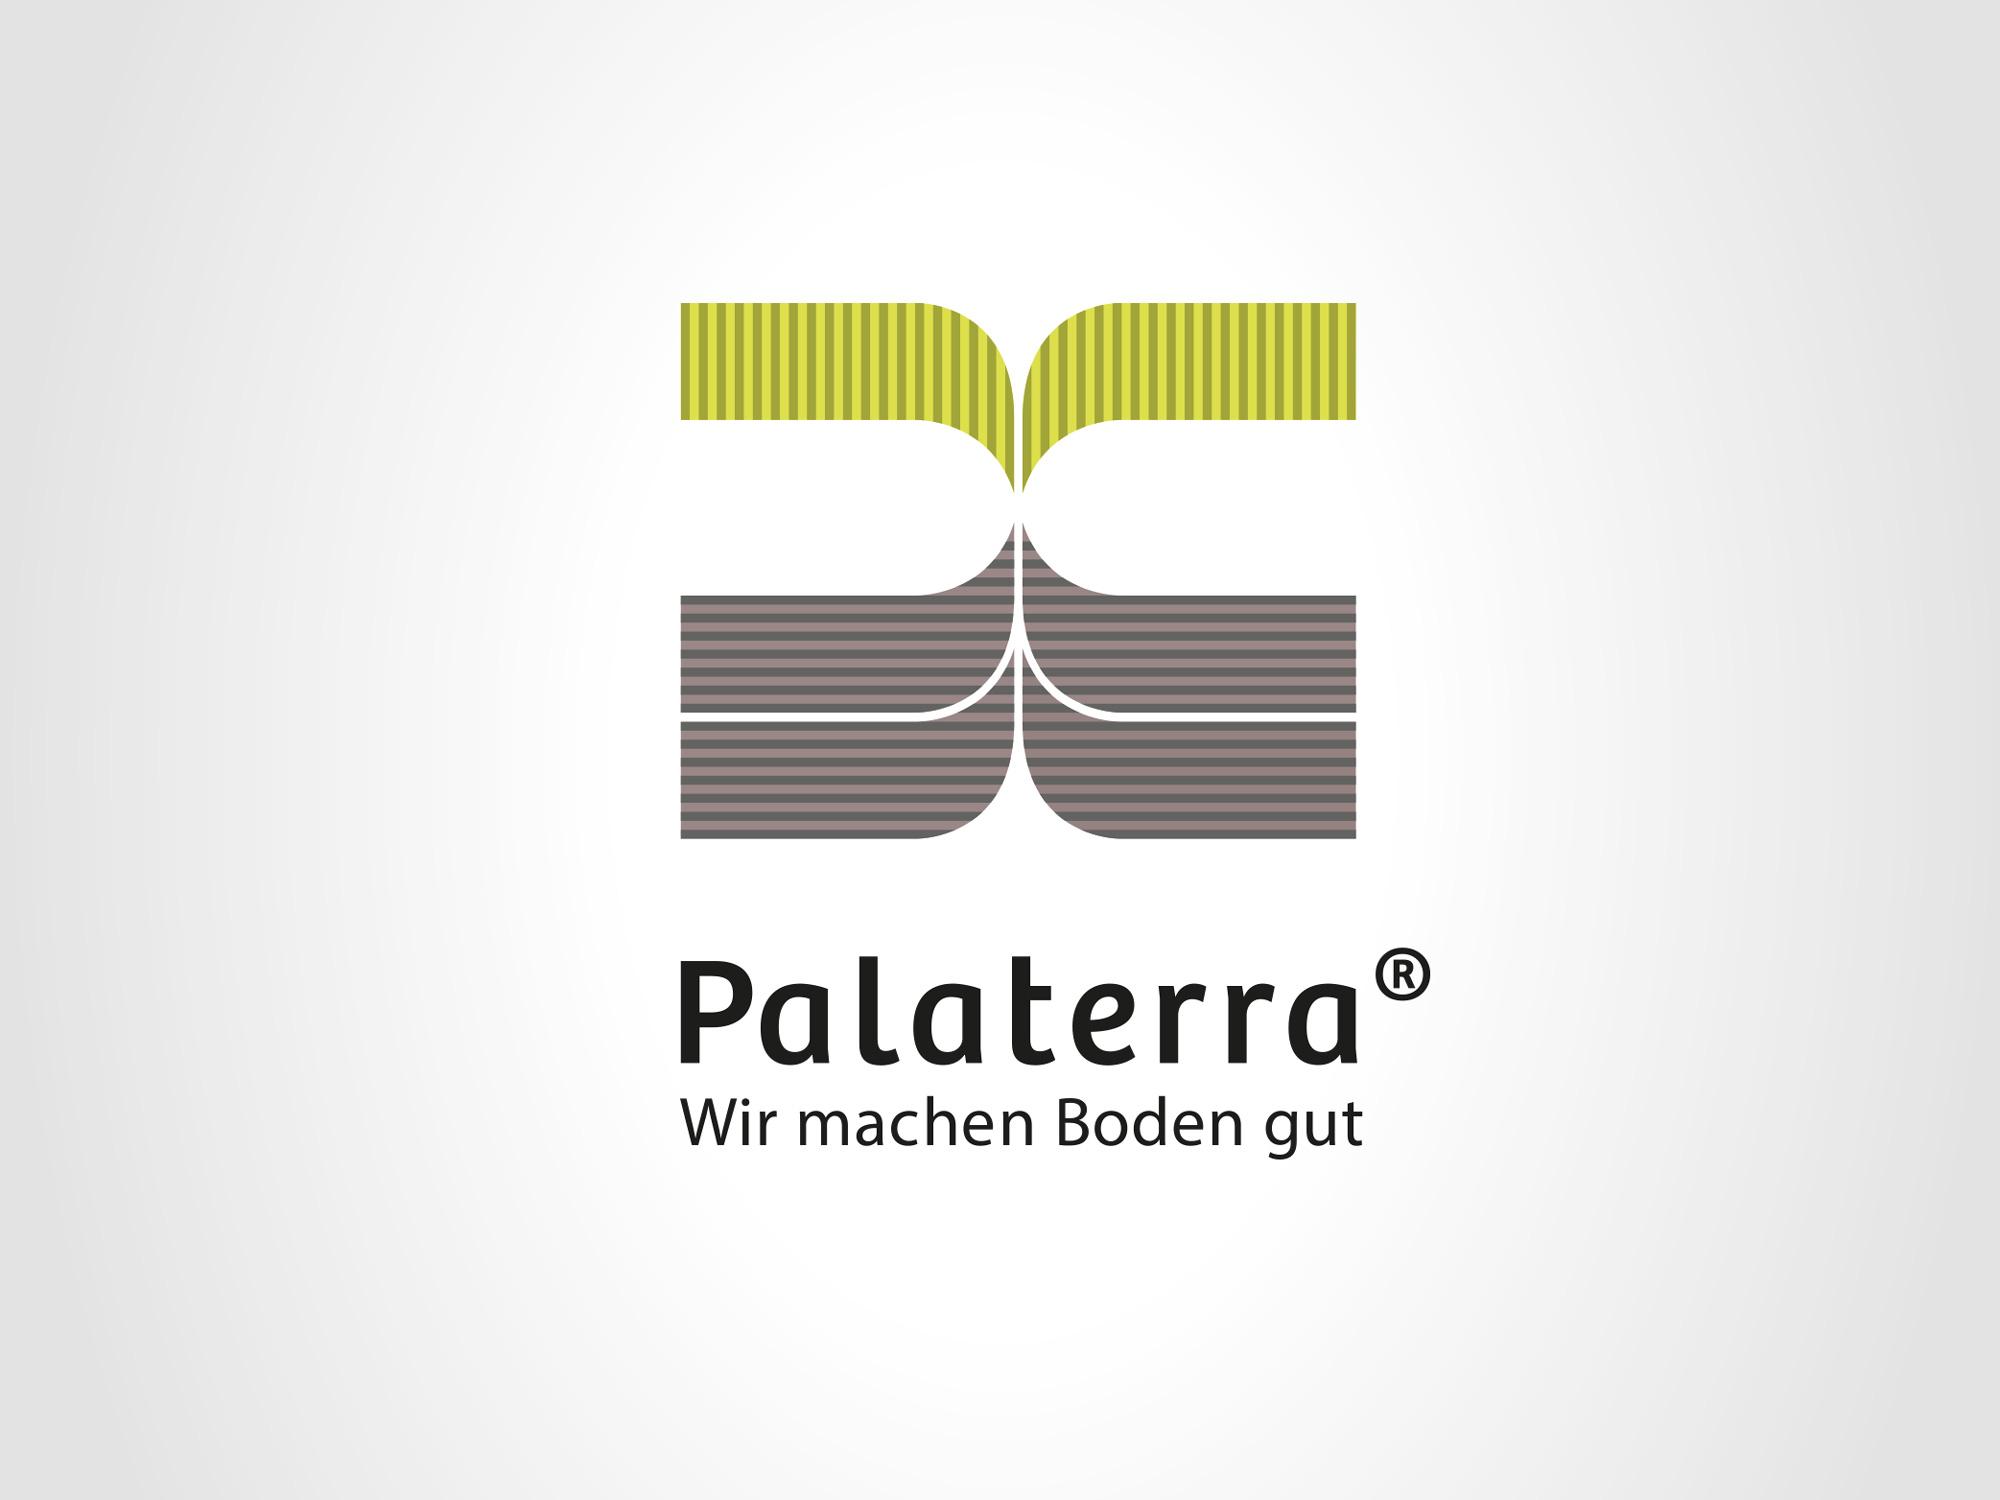 Palaterra_Logo_2000x1500px